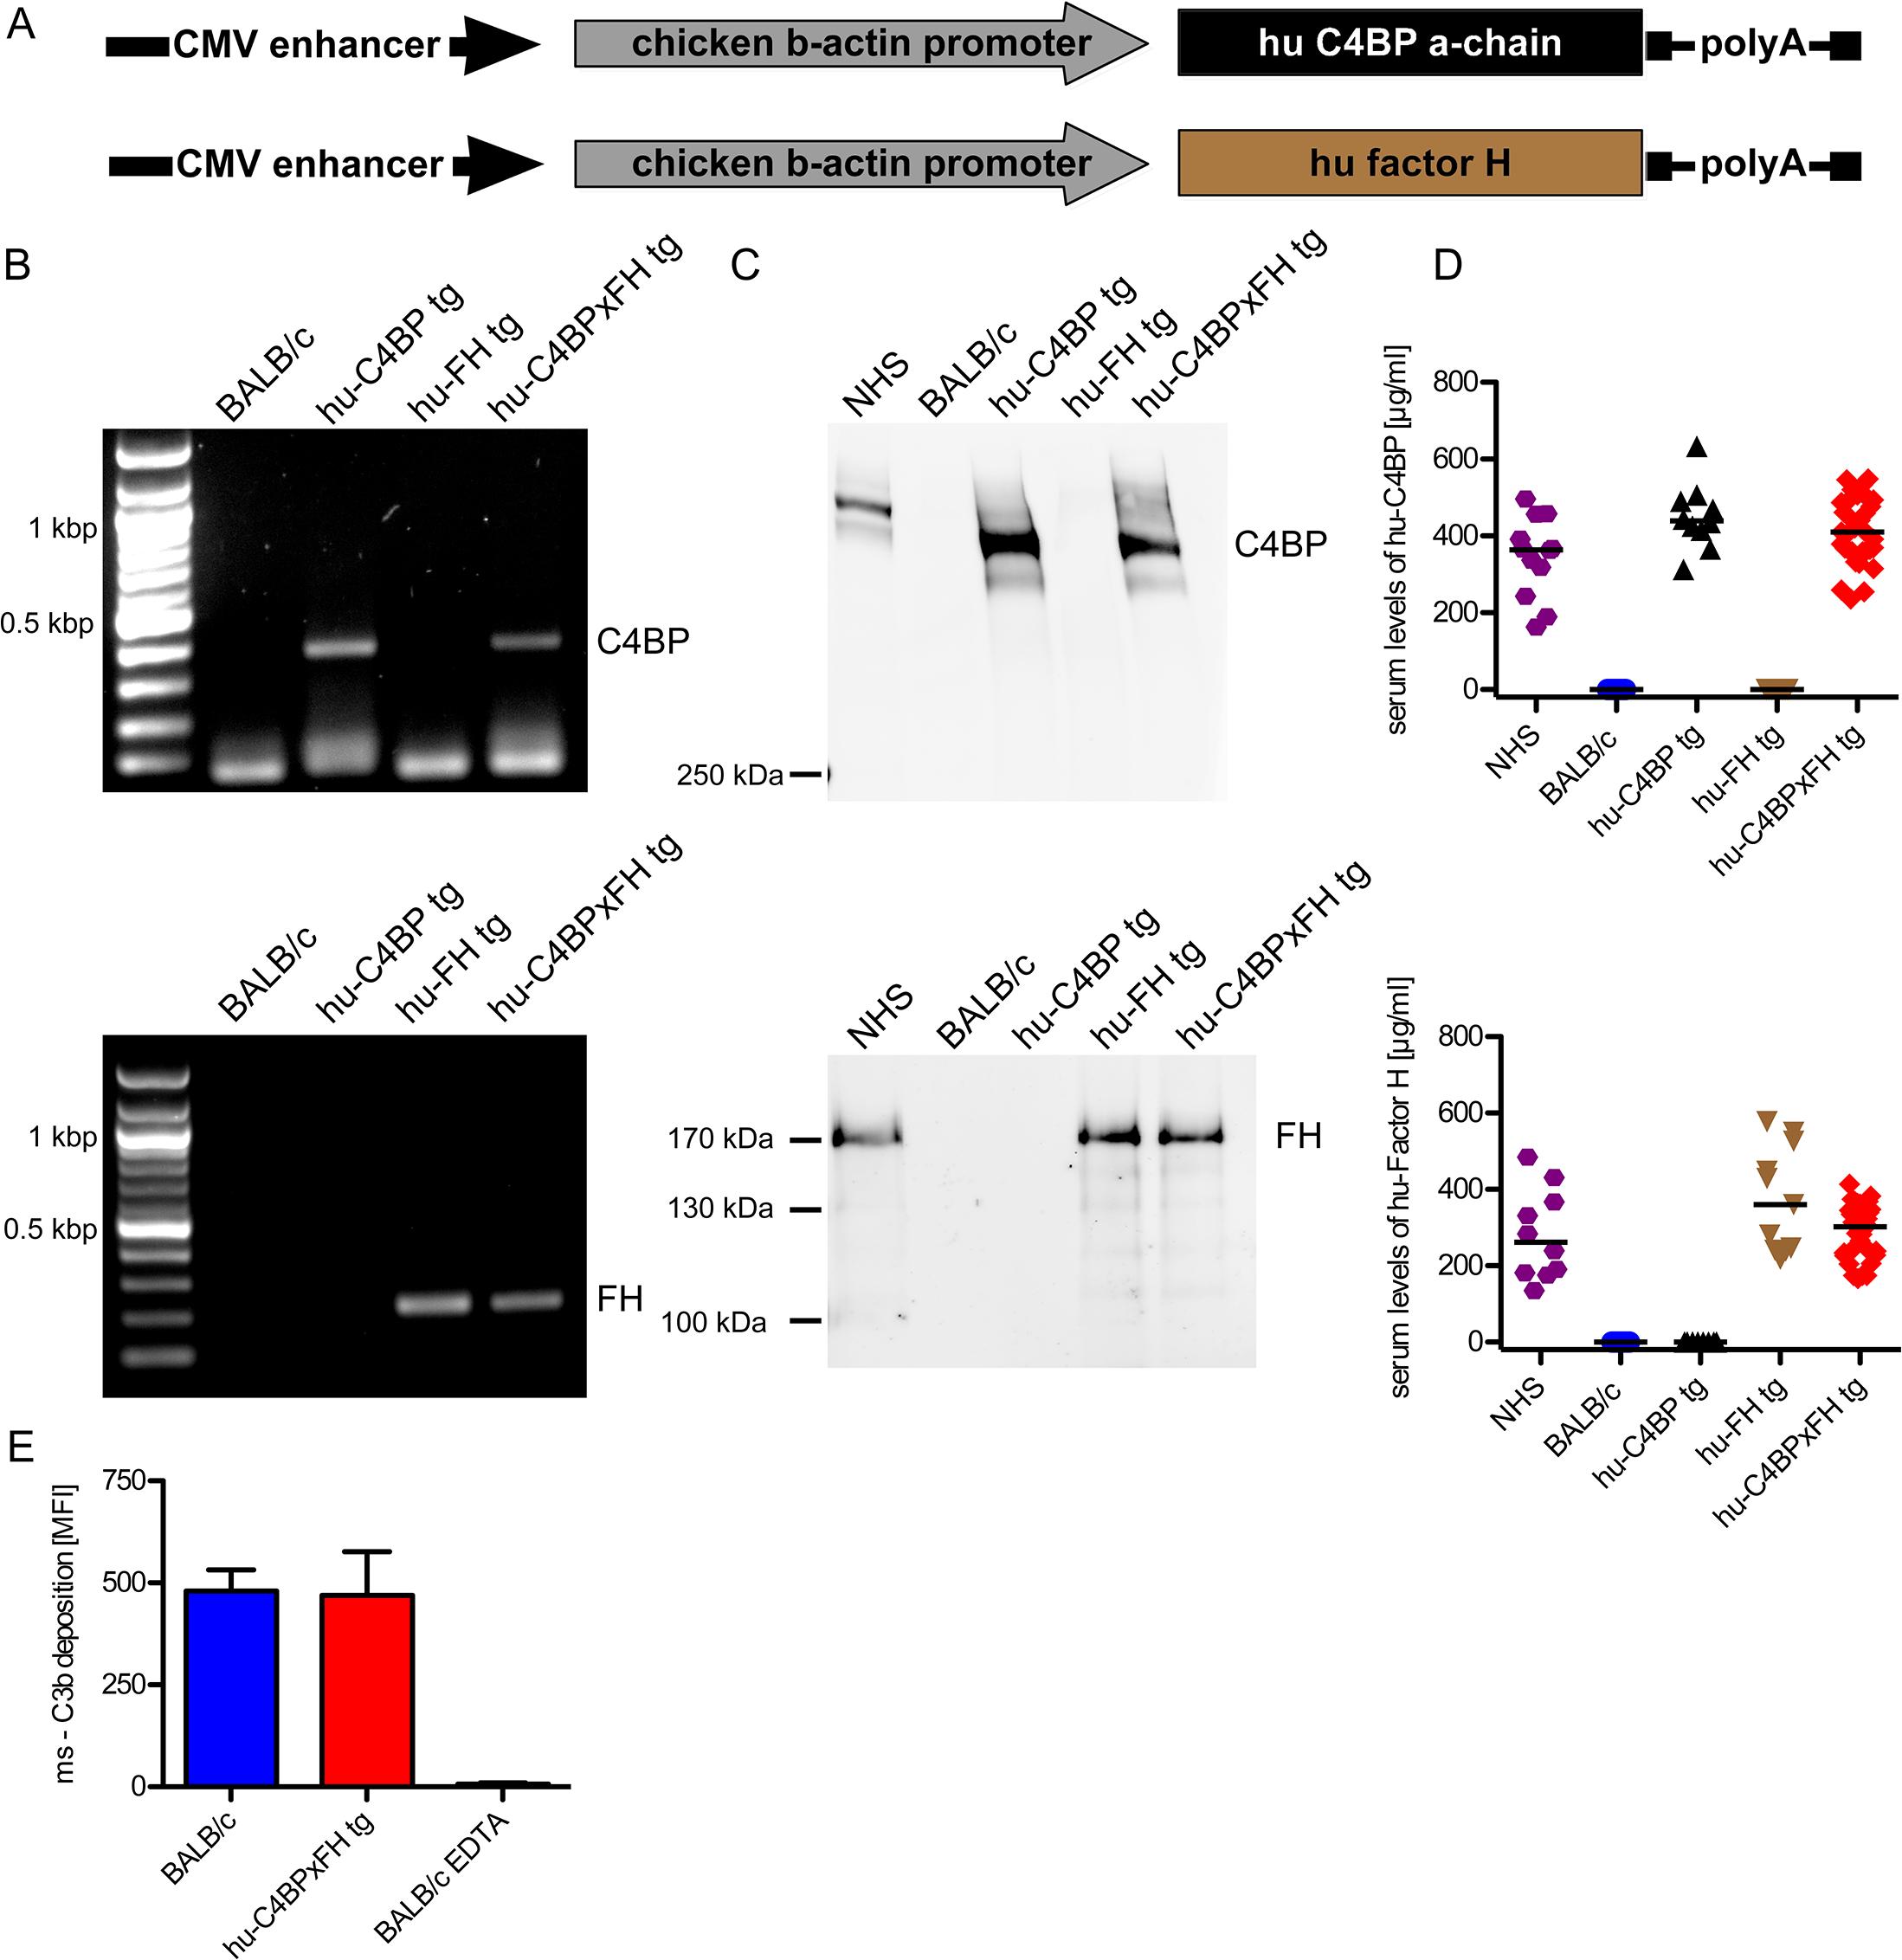 Construction of hu-C4BP, hu-FH and C4BPxFH tg BALB/c mice.